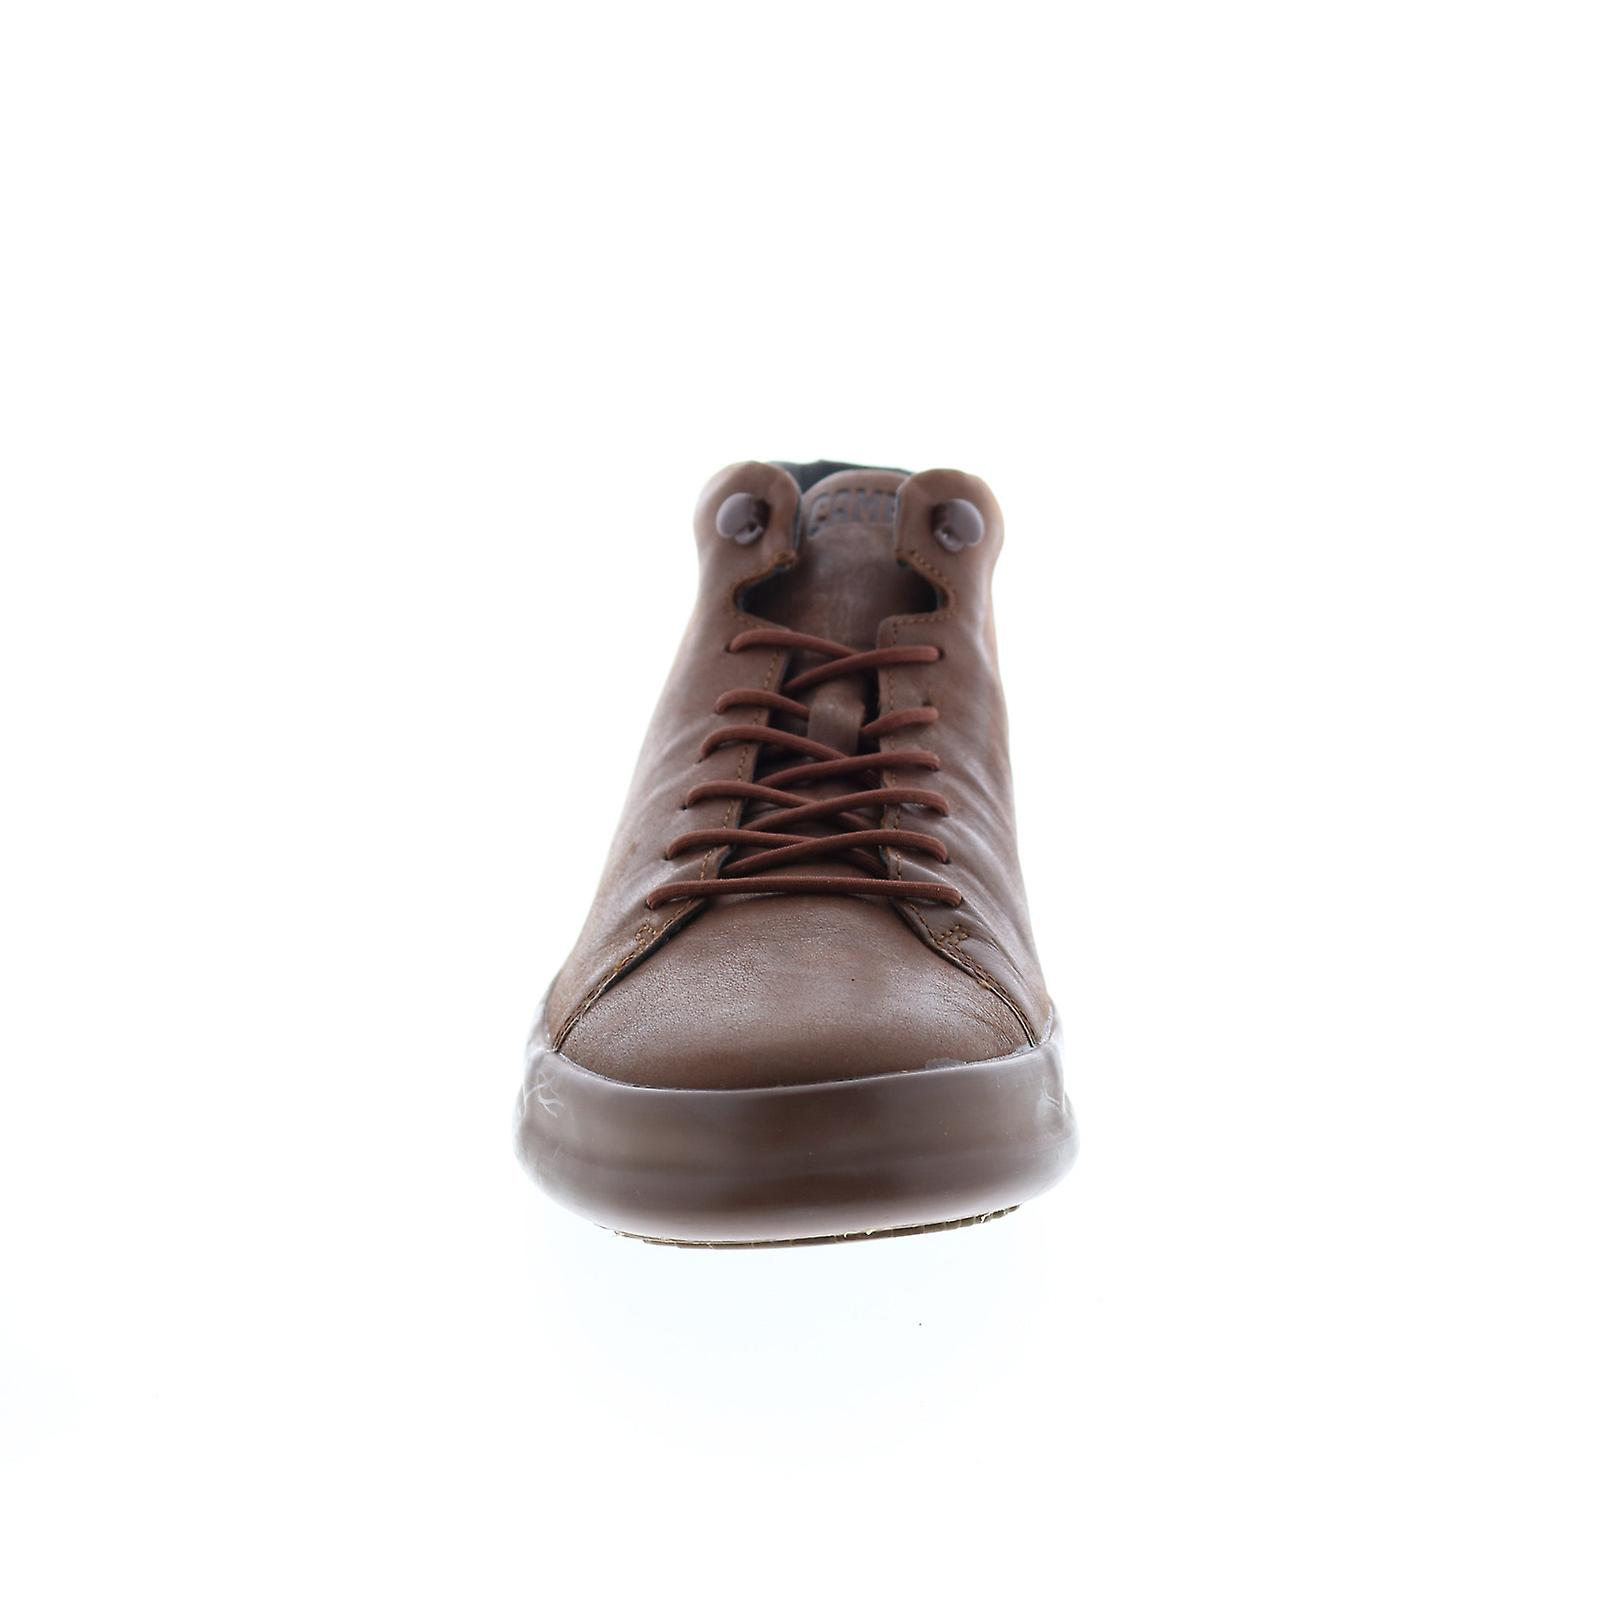 camper chasis sport menns brune skinn blonder opp euro joggesko sko